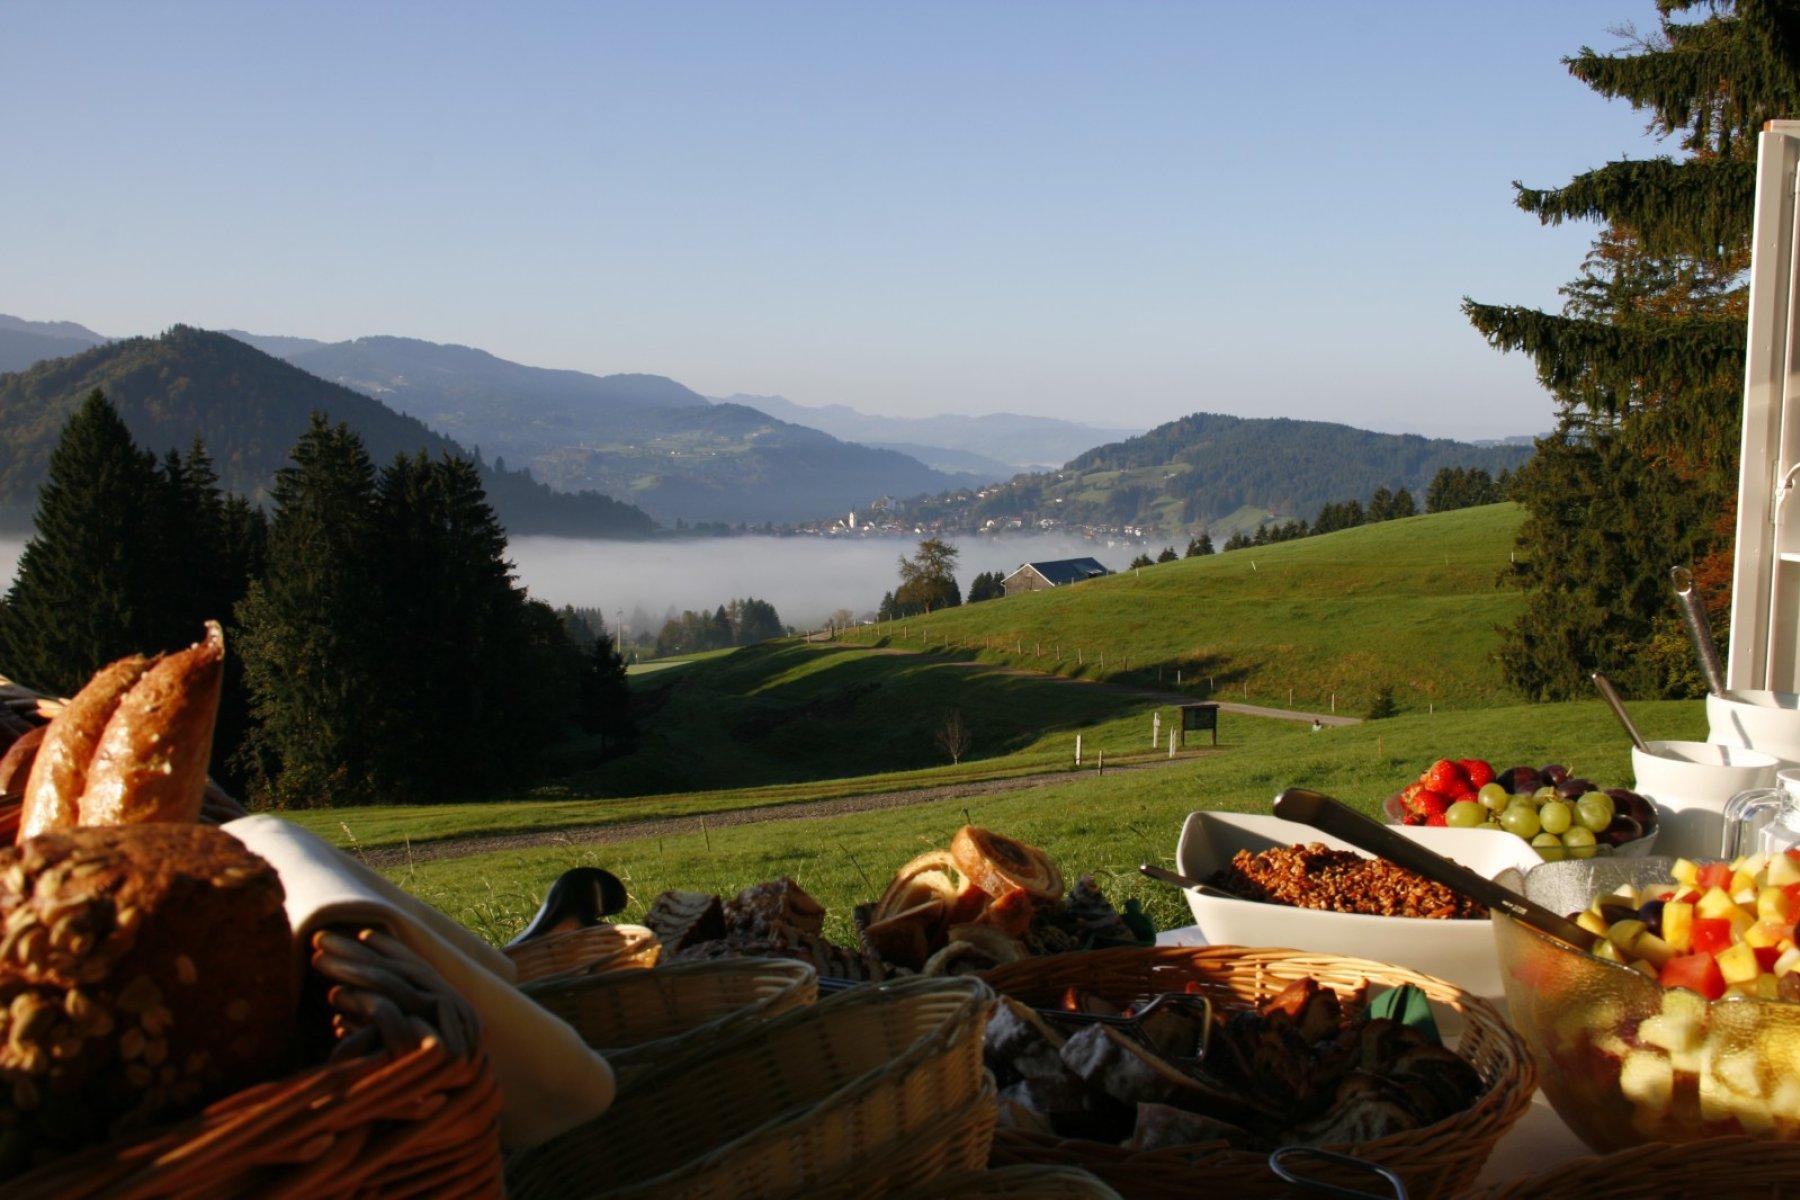 Ausblick auf Berglandschaft beim Kurzurlaub im Allgäu